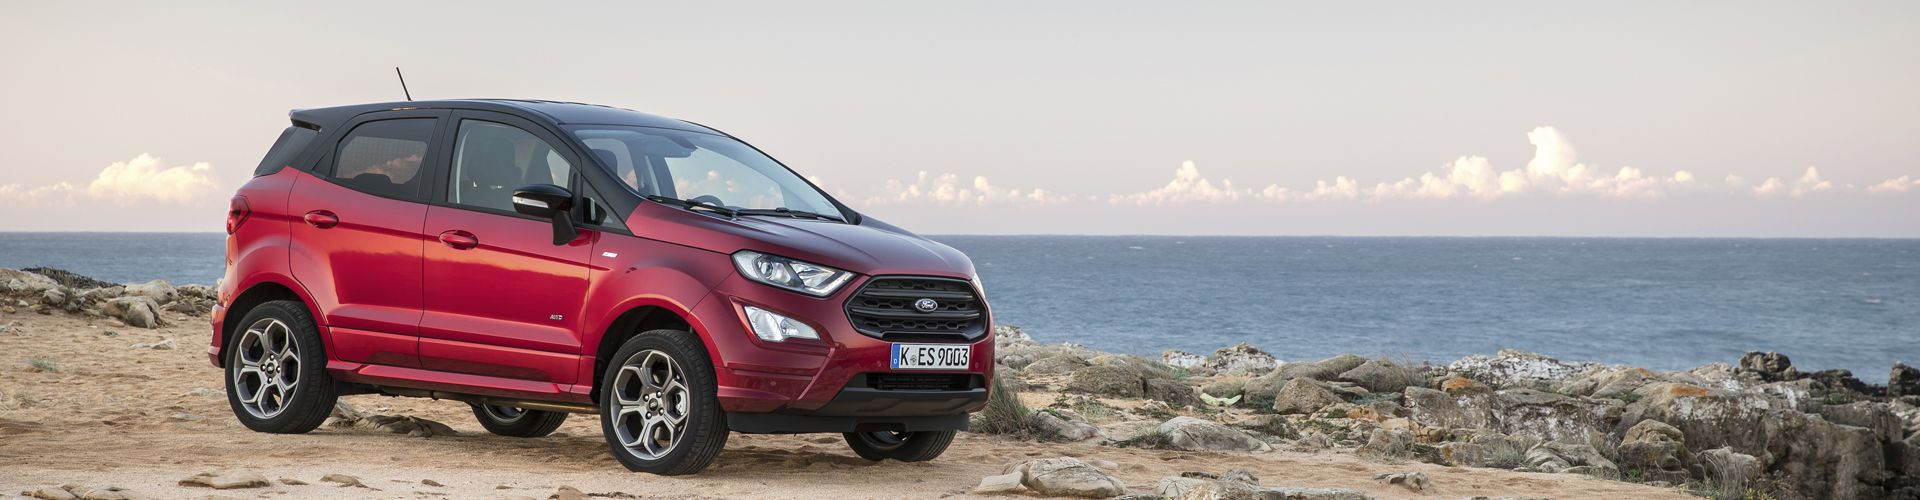 Ford Ecosport - Α. Λιάπης Αντιπροσωπεία